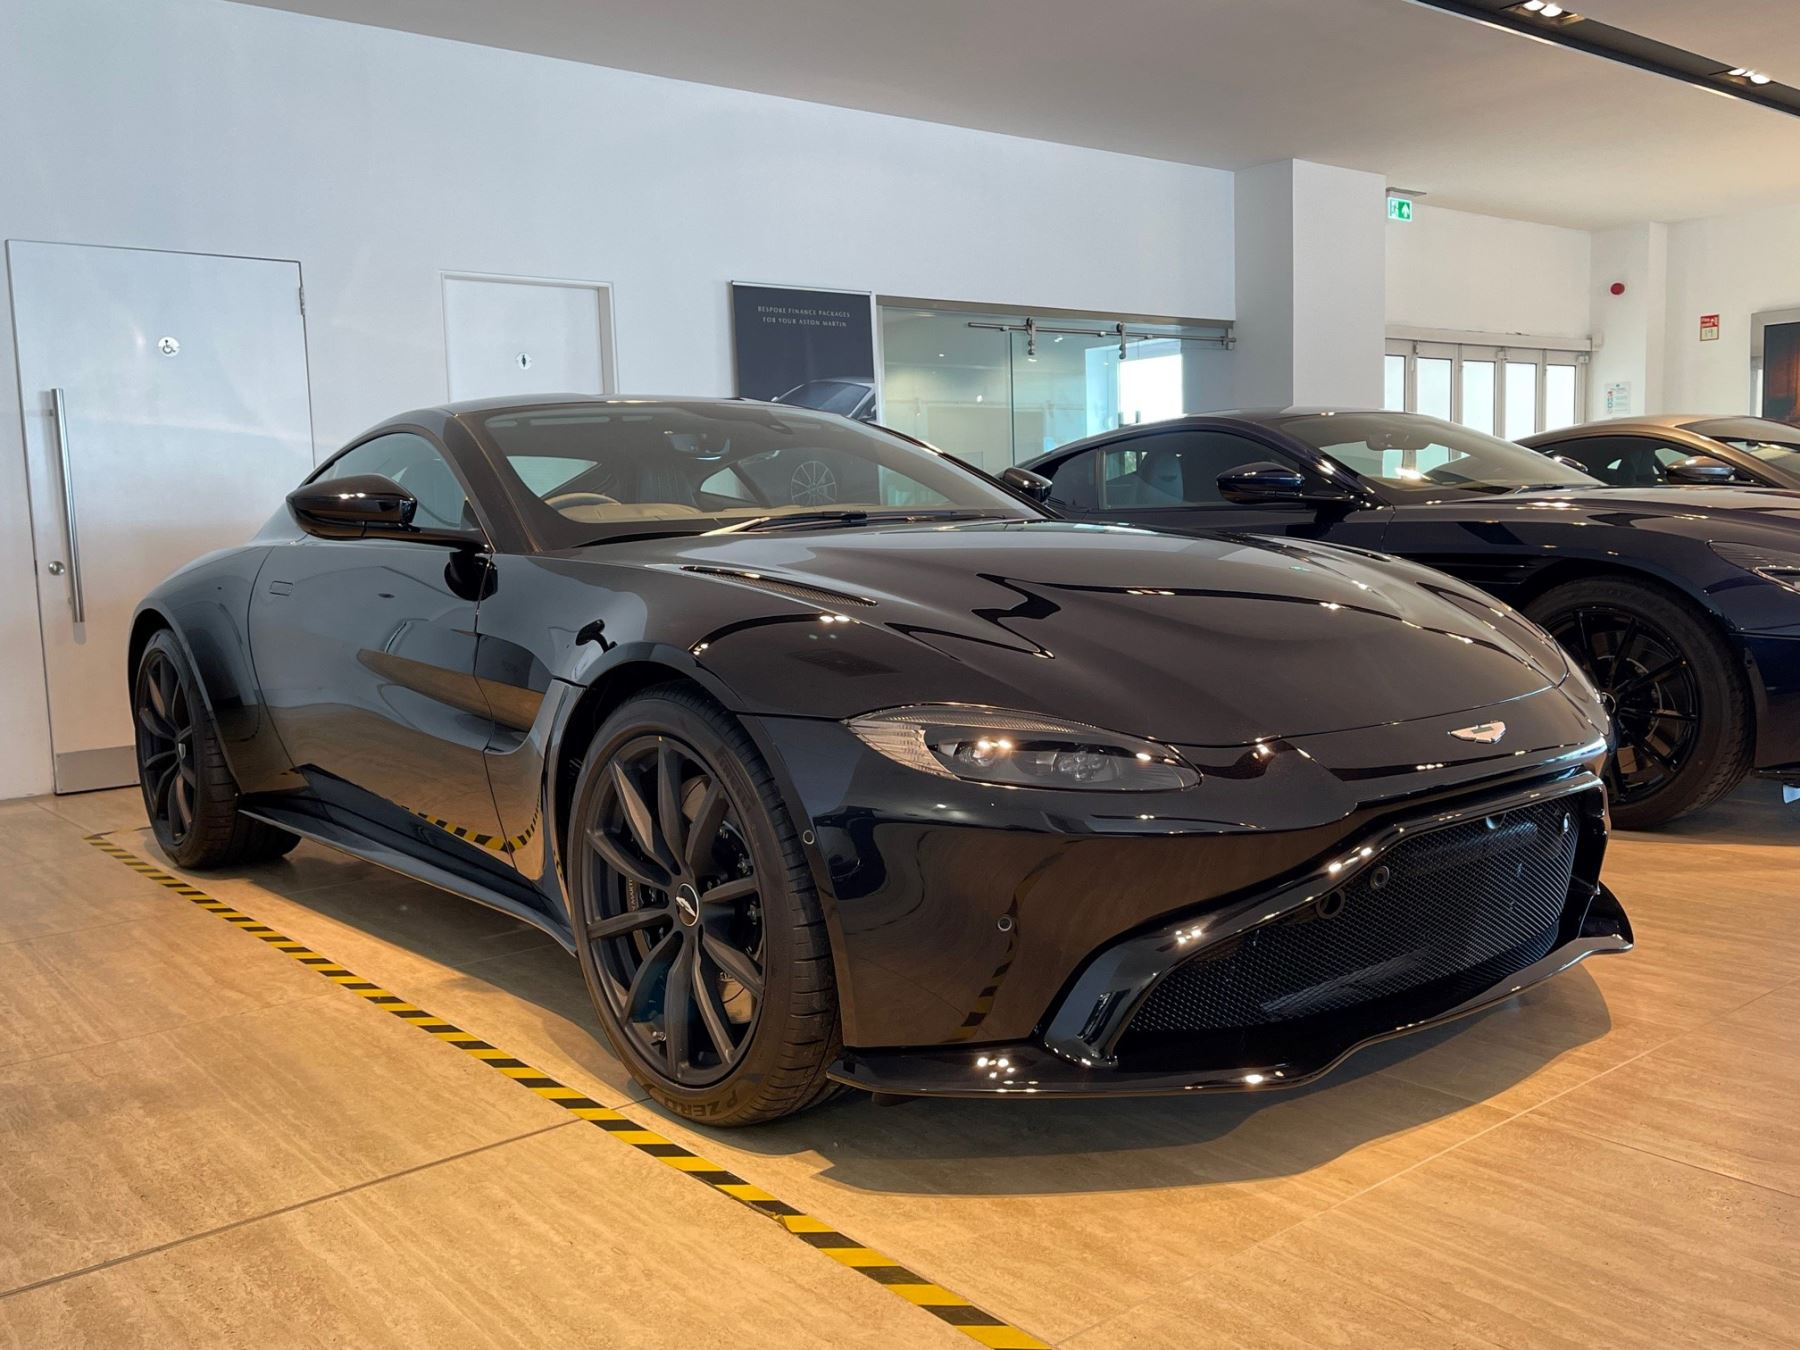 Aston Martin V8 Vantage 2dr 4.0 Automatic Coupe